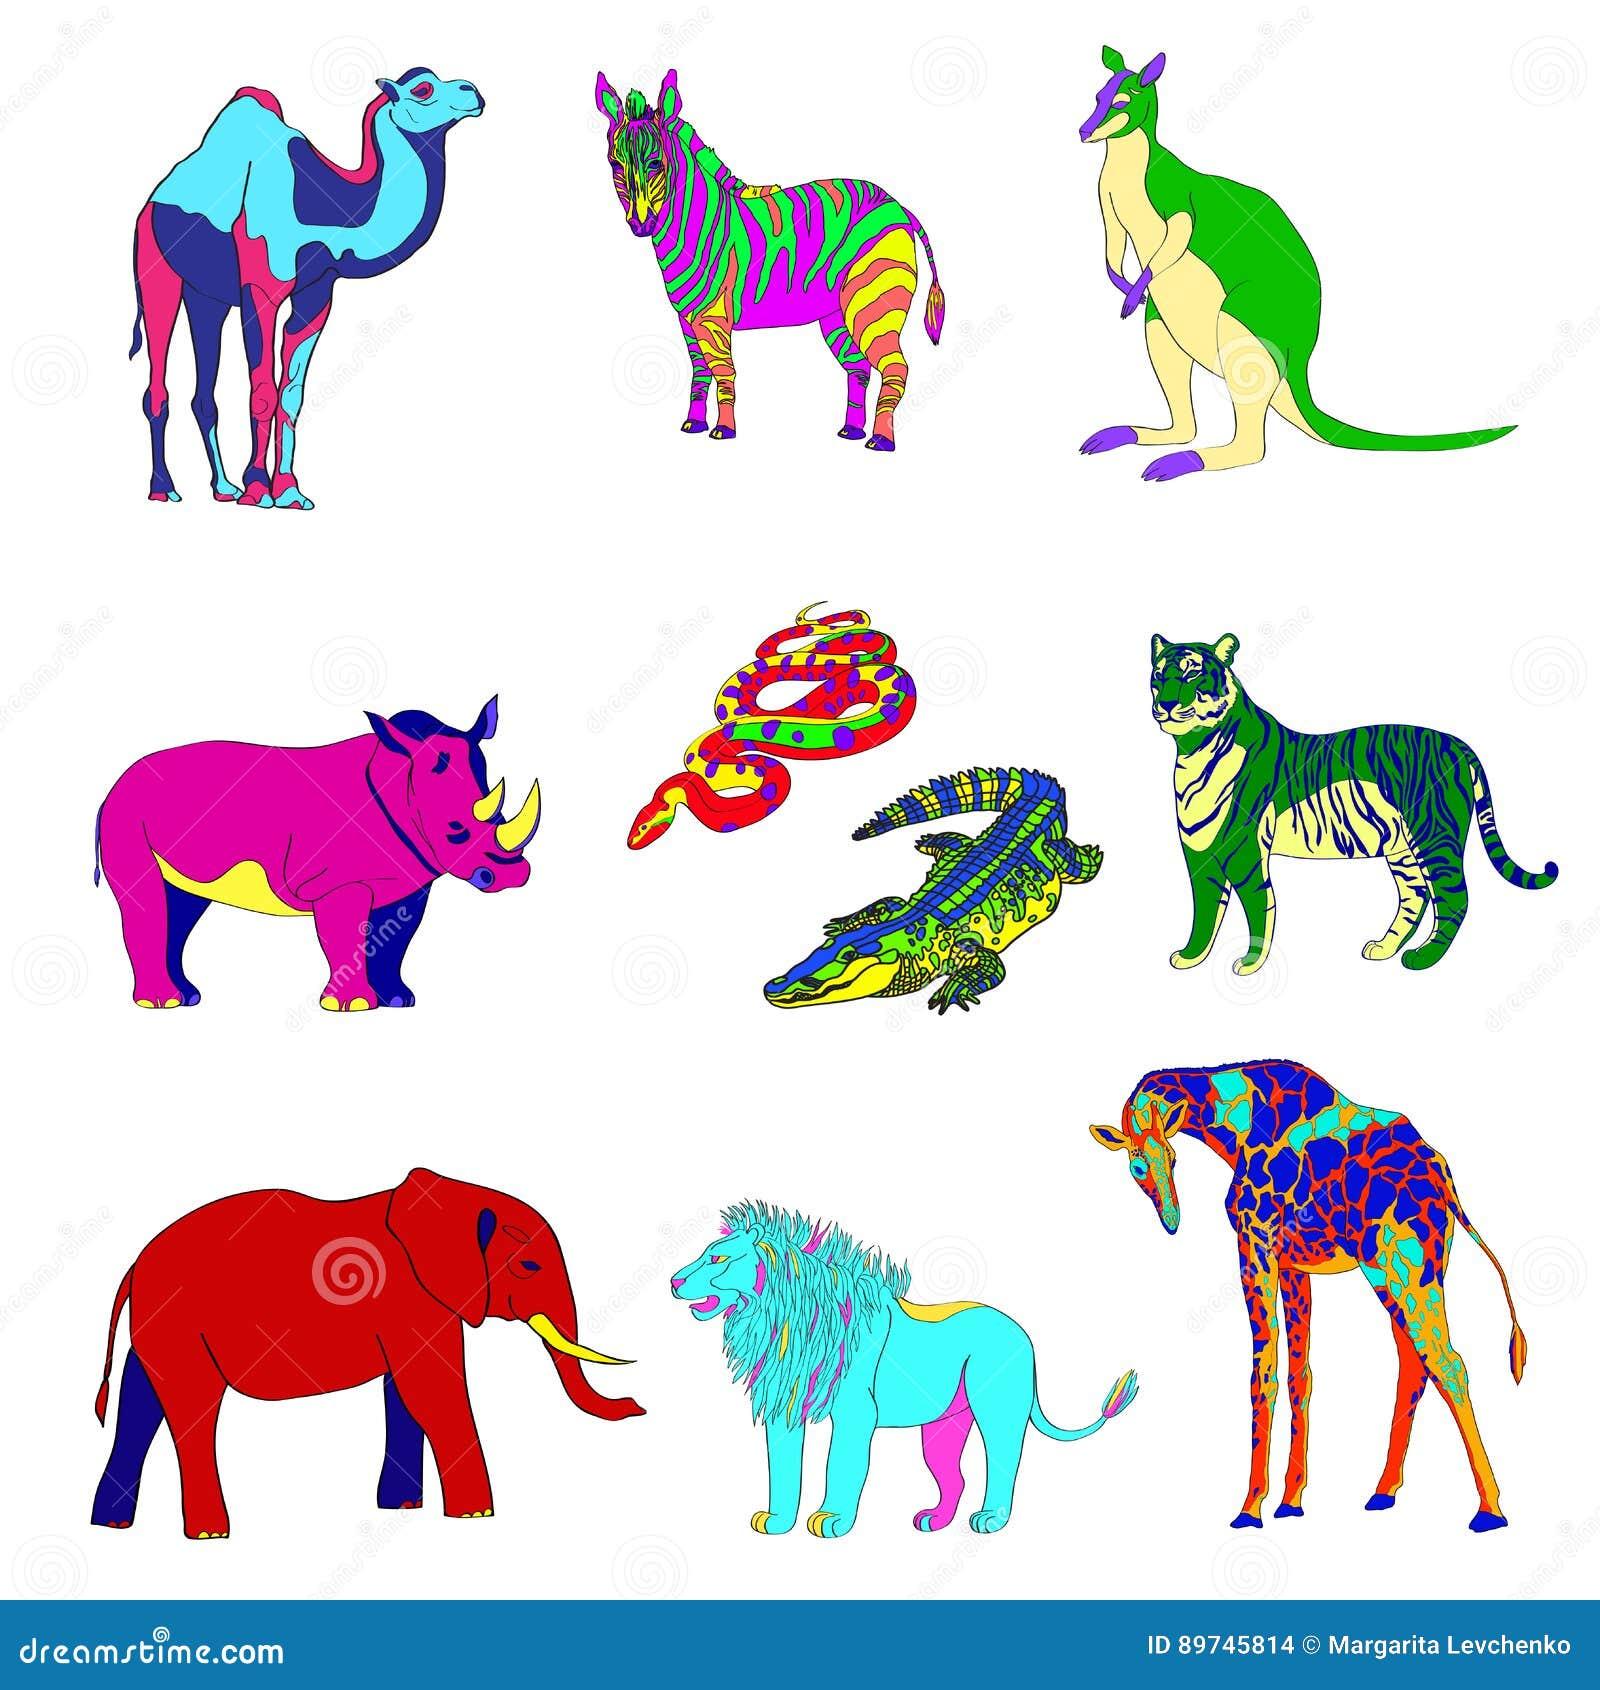 Картинки рыба лев тигр попугай жираф слон